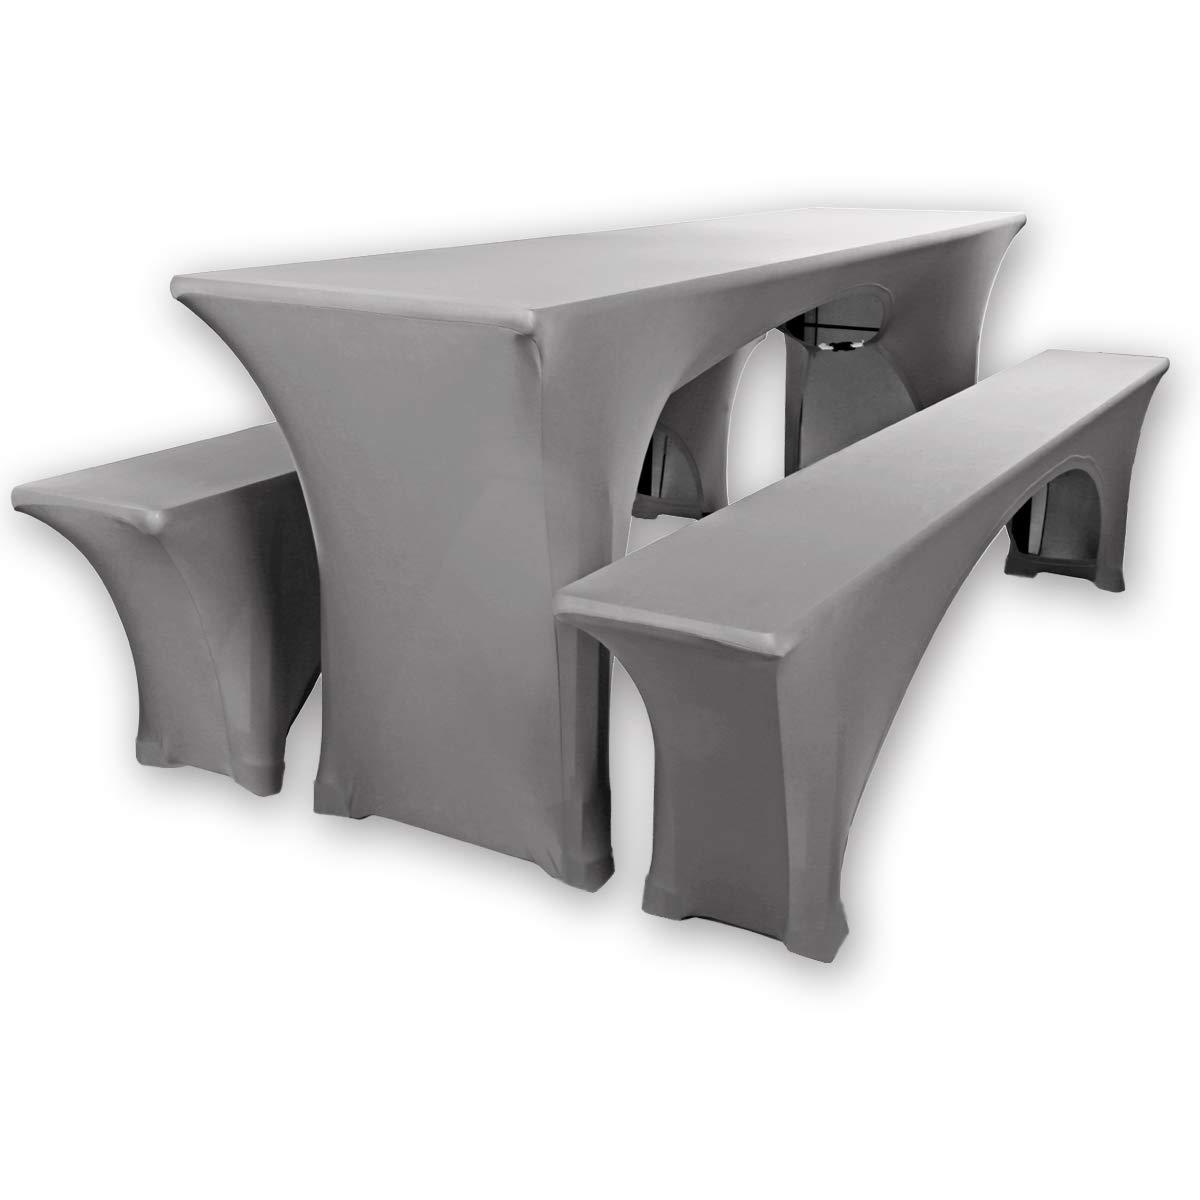 Gräfenstayn® Leopold - Copertura per tavolo elasticizzata, set da 3pezzi, larghezza tavolo: 70cm o 50cm, a norma Standard 100 by Öko-Tex, Anthrazit, 50 x 220 cm set da 3pezzi larghezza tavolo: 70cm o 50cm Gräfenstayn